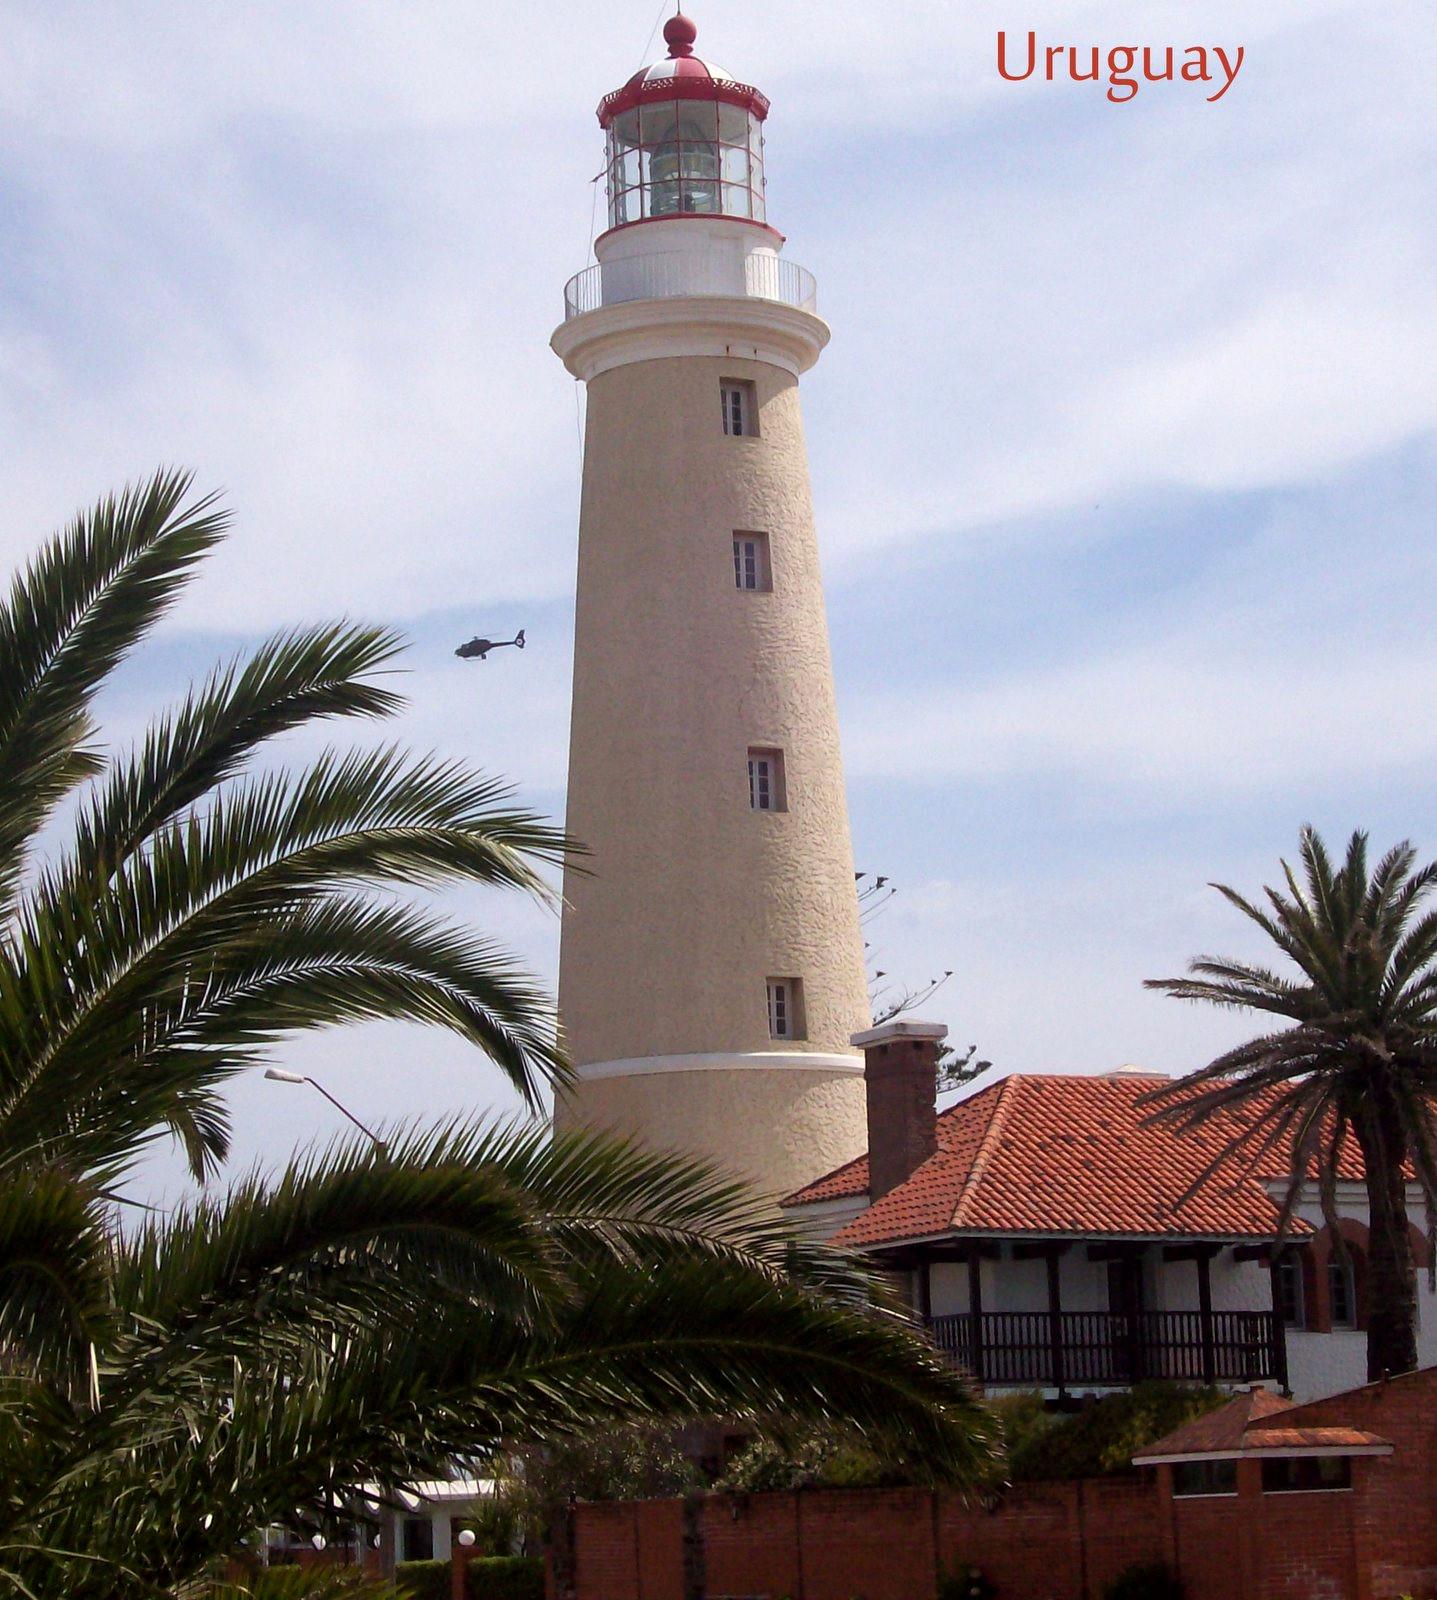 Leuchtturm von Punta del Este am Rio de la Plata